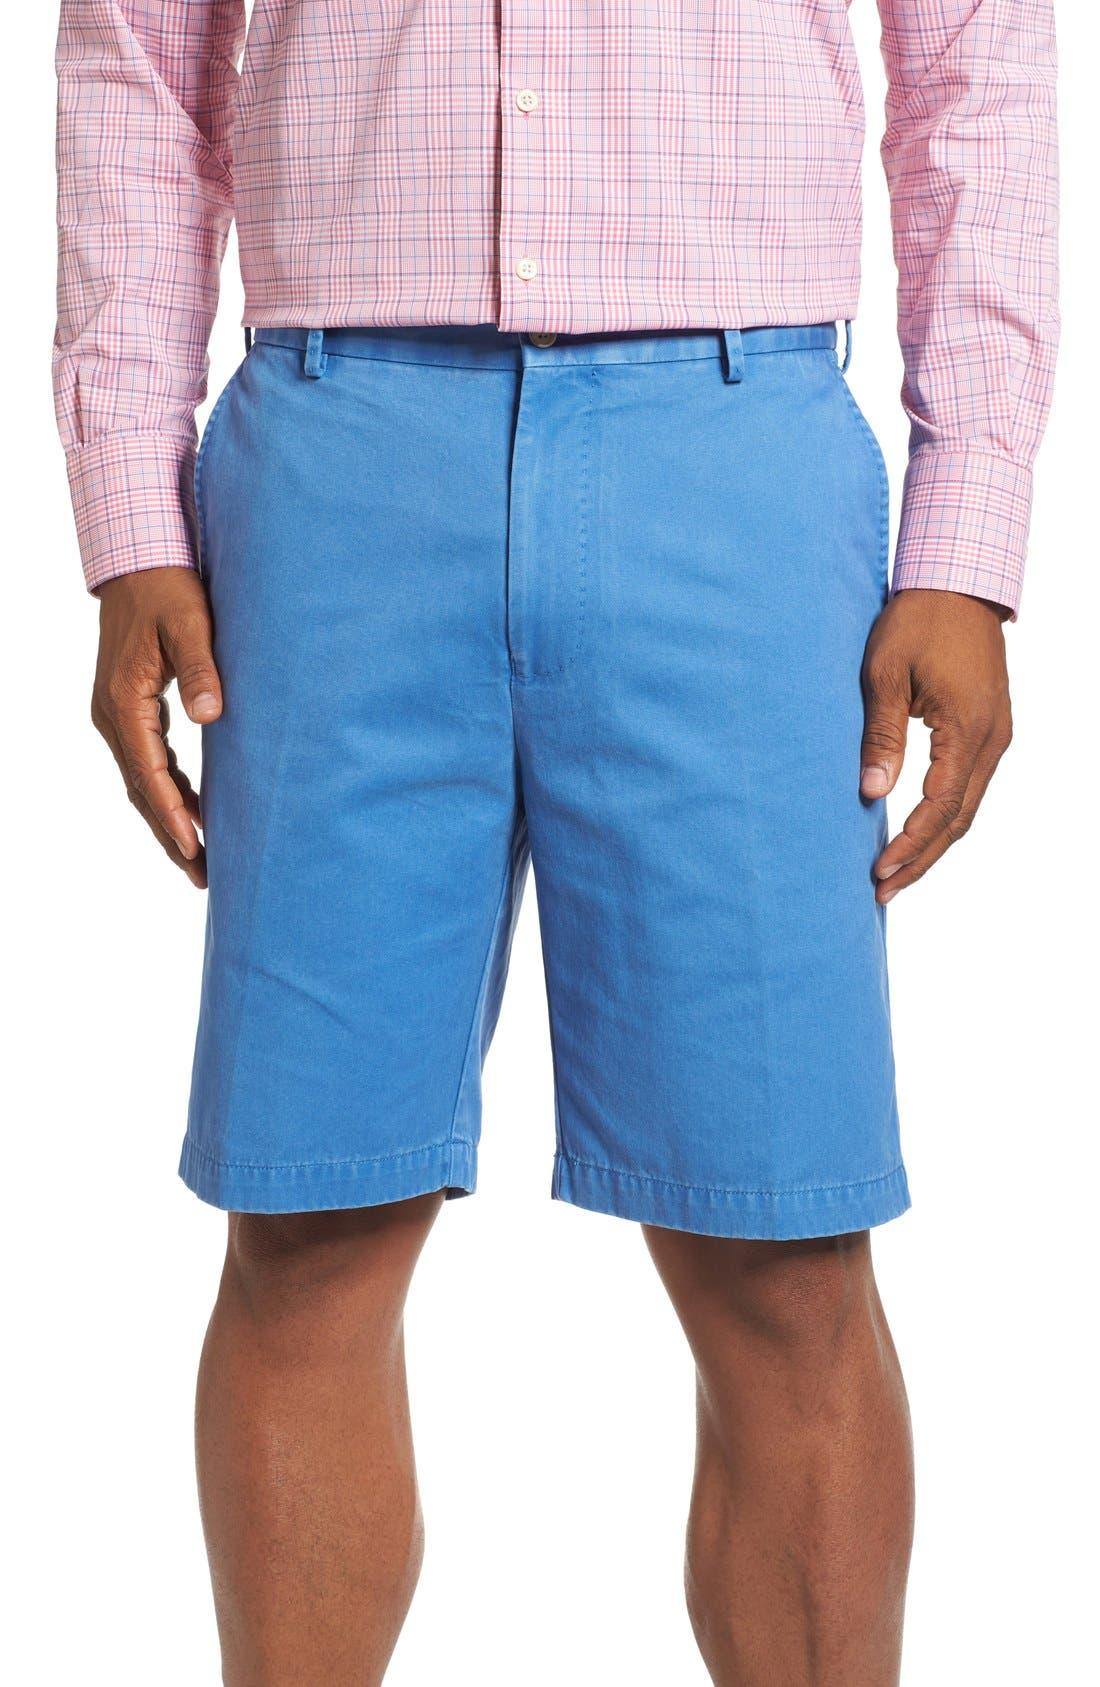 Peter Millar 'Winston' Washed Twill Flat Front Shorts